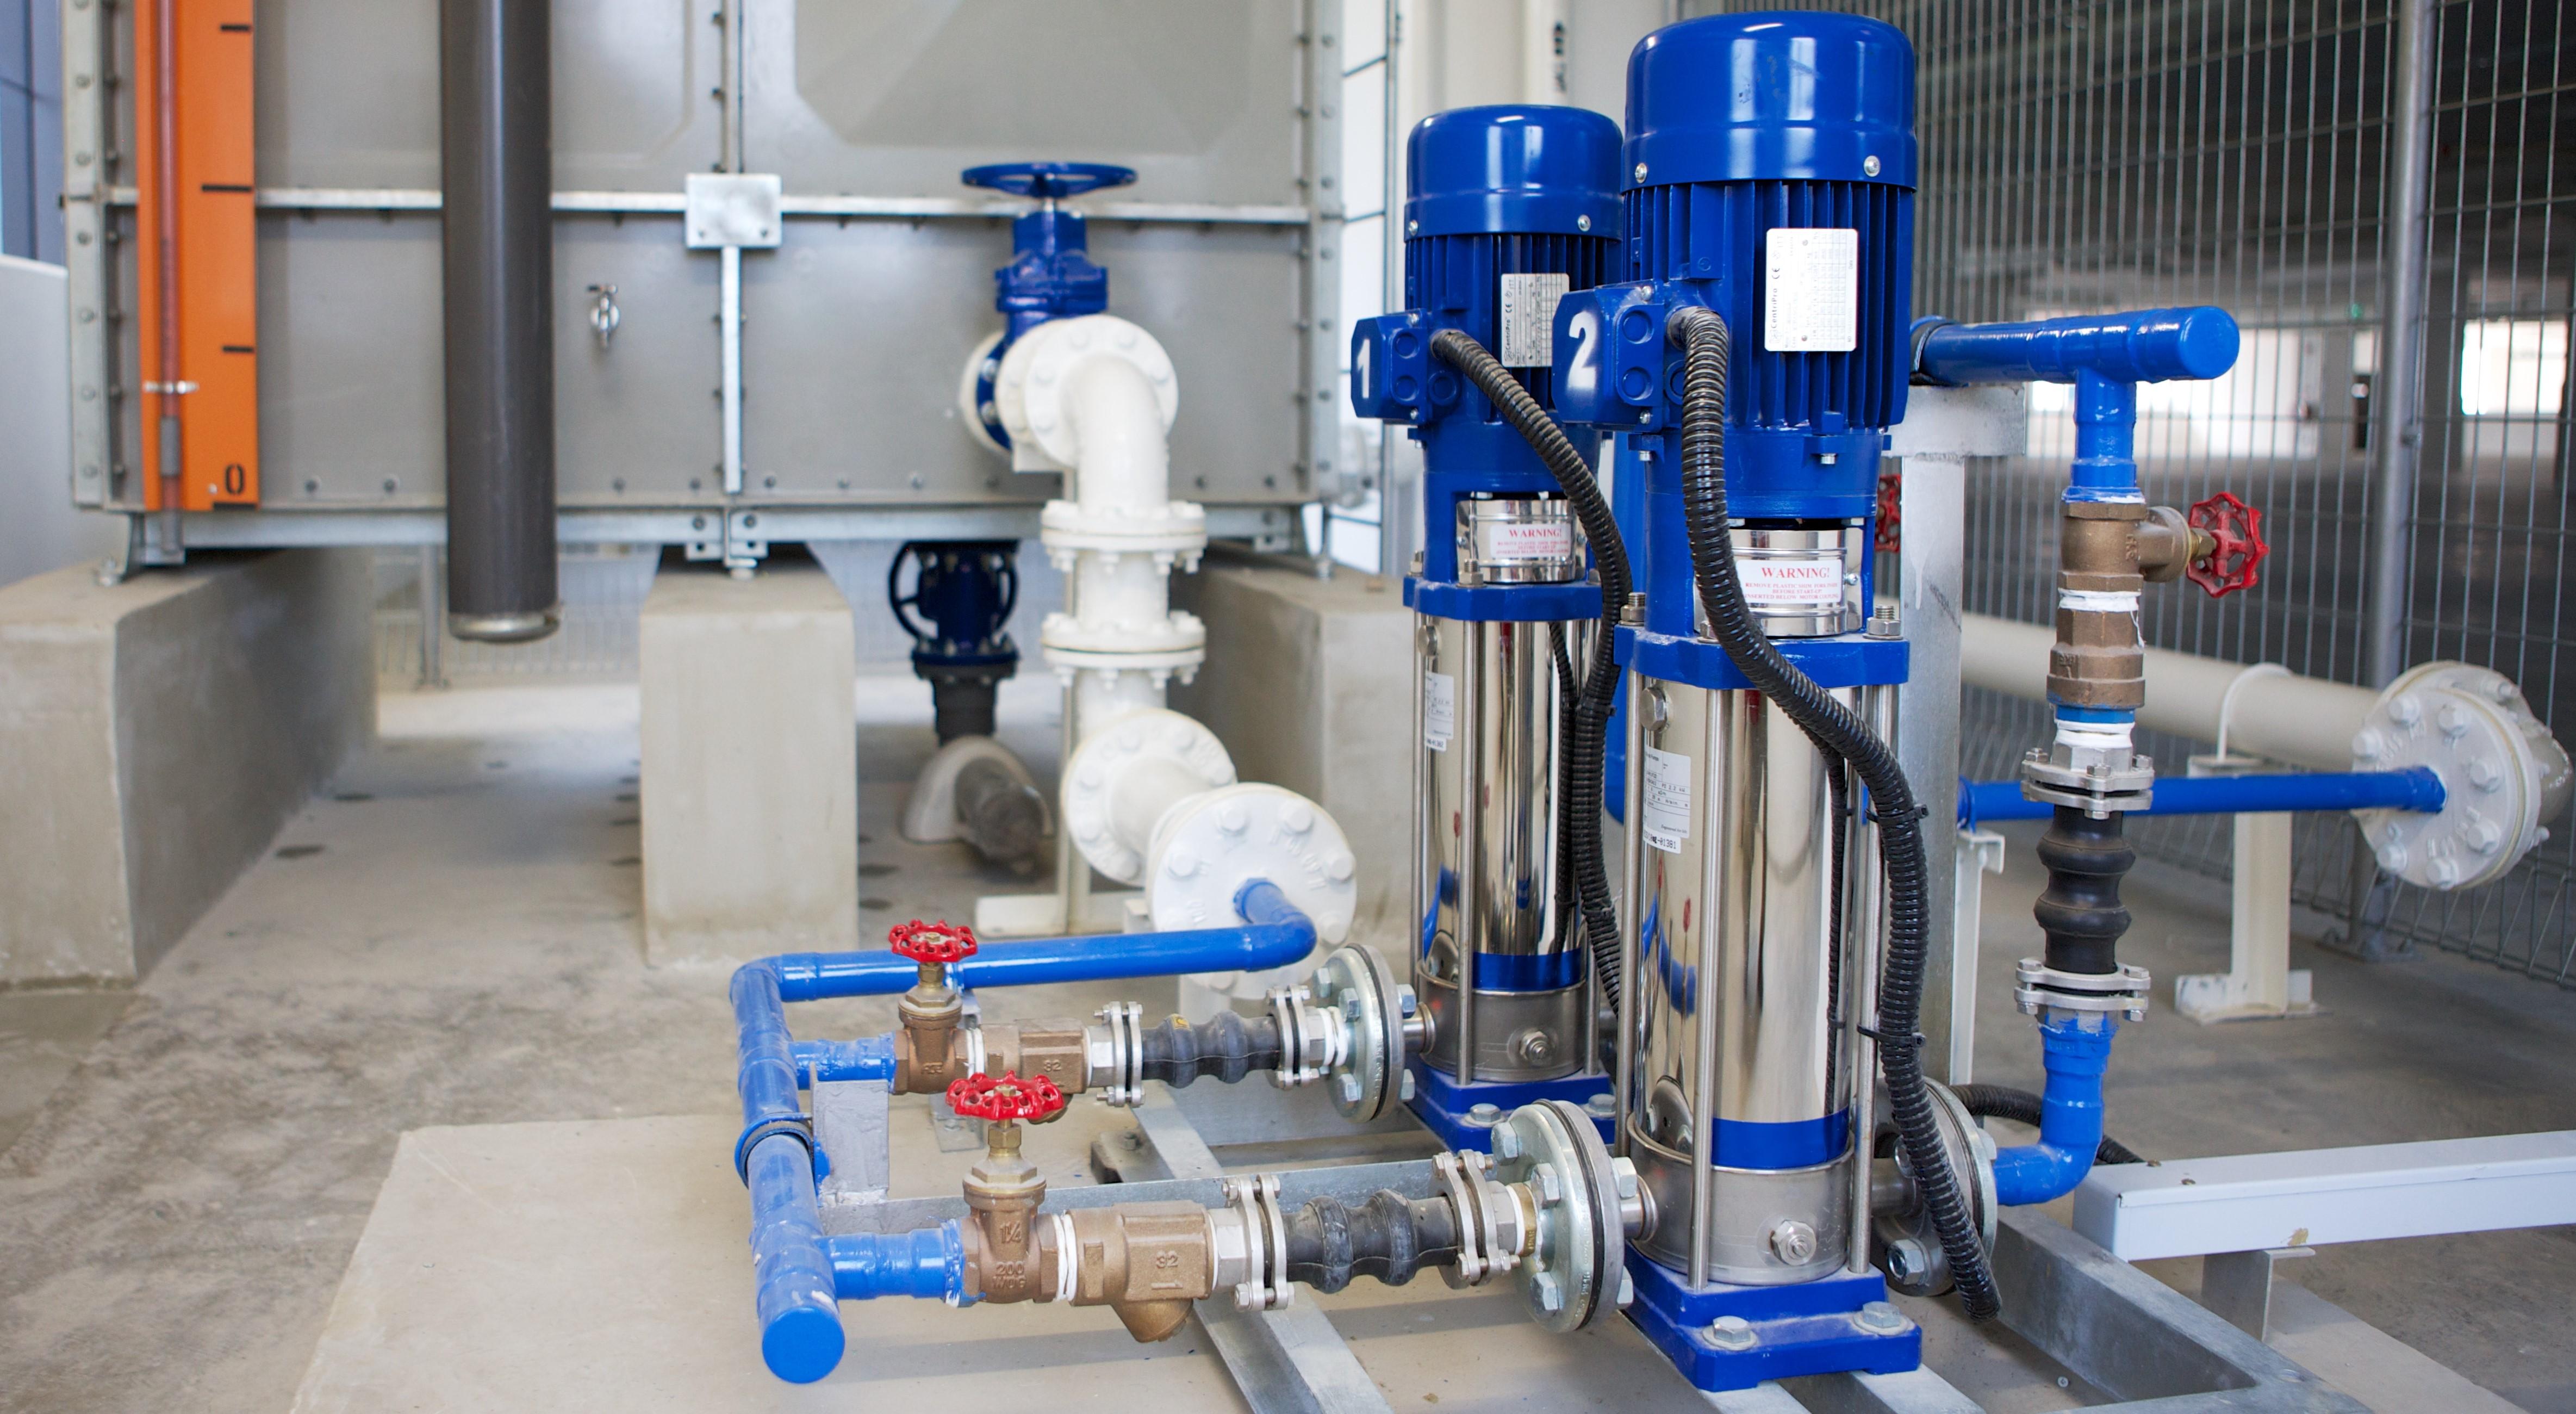 Leading group sac administradora de edificios y condominios for Compresor hidroneumatico